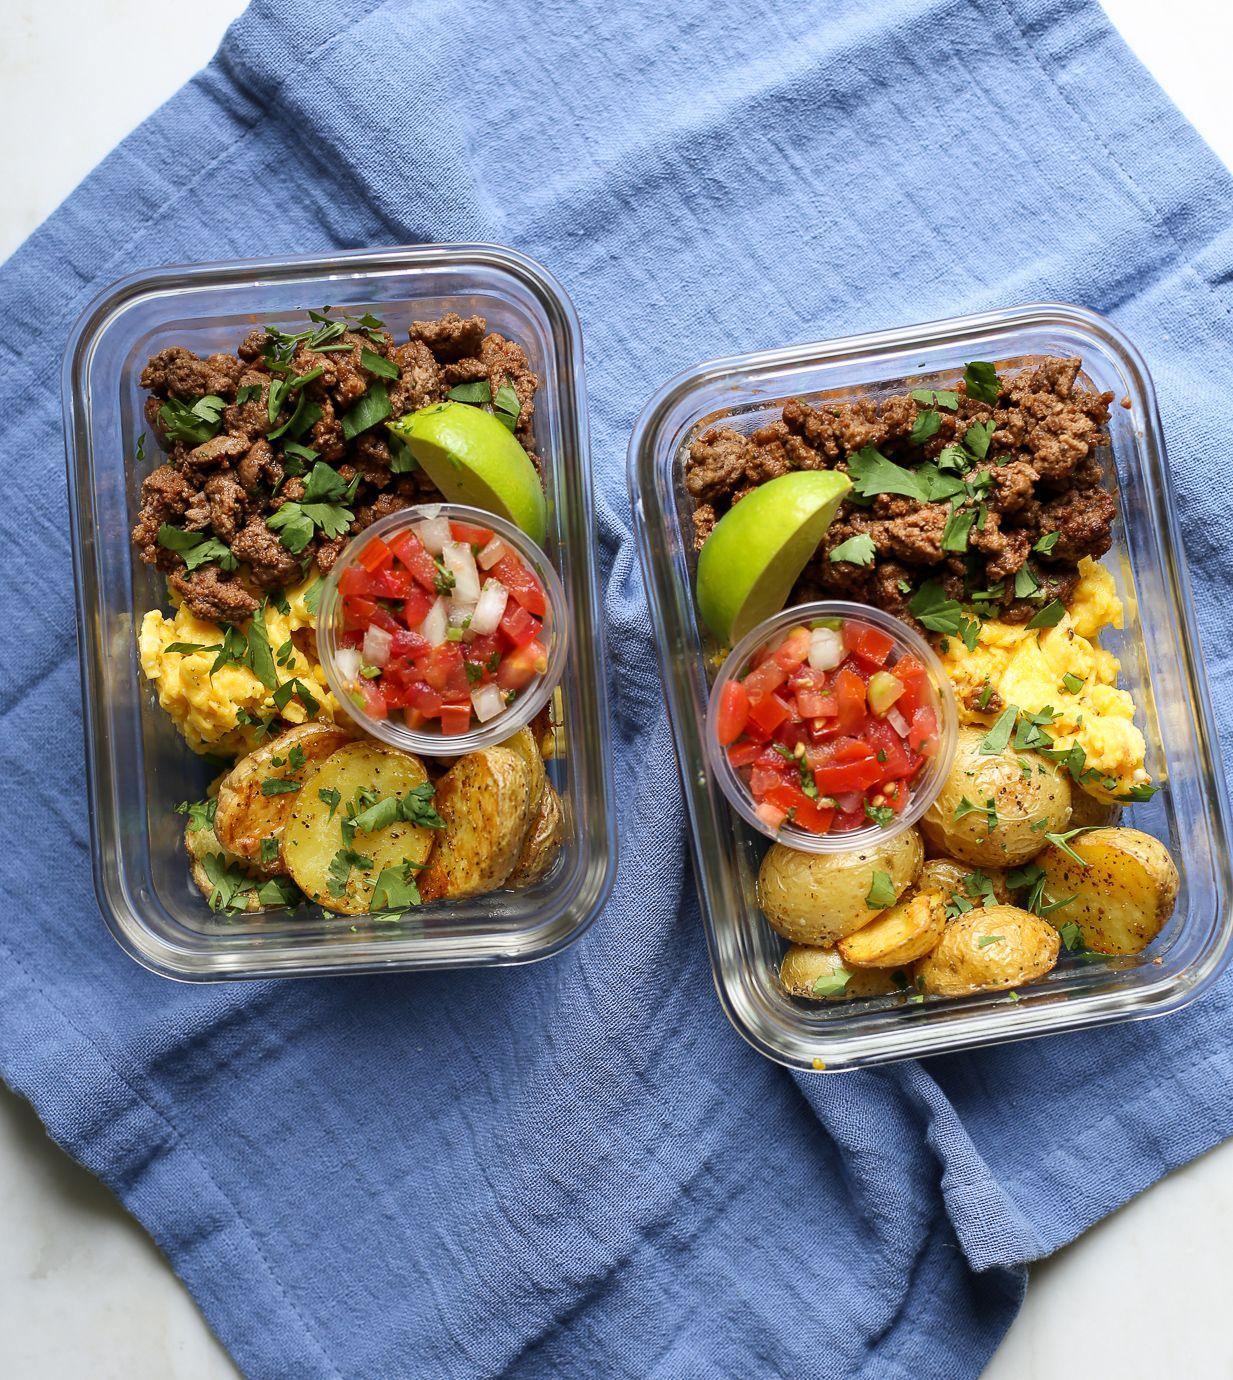 Sweet Potato Breakfast Tacos: NO SALSA // USE SWEET POTATOES // Meal Prep Breakfast Taco